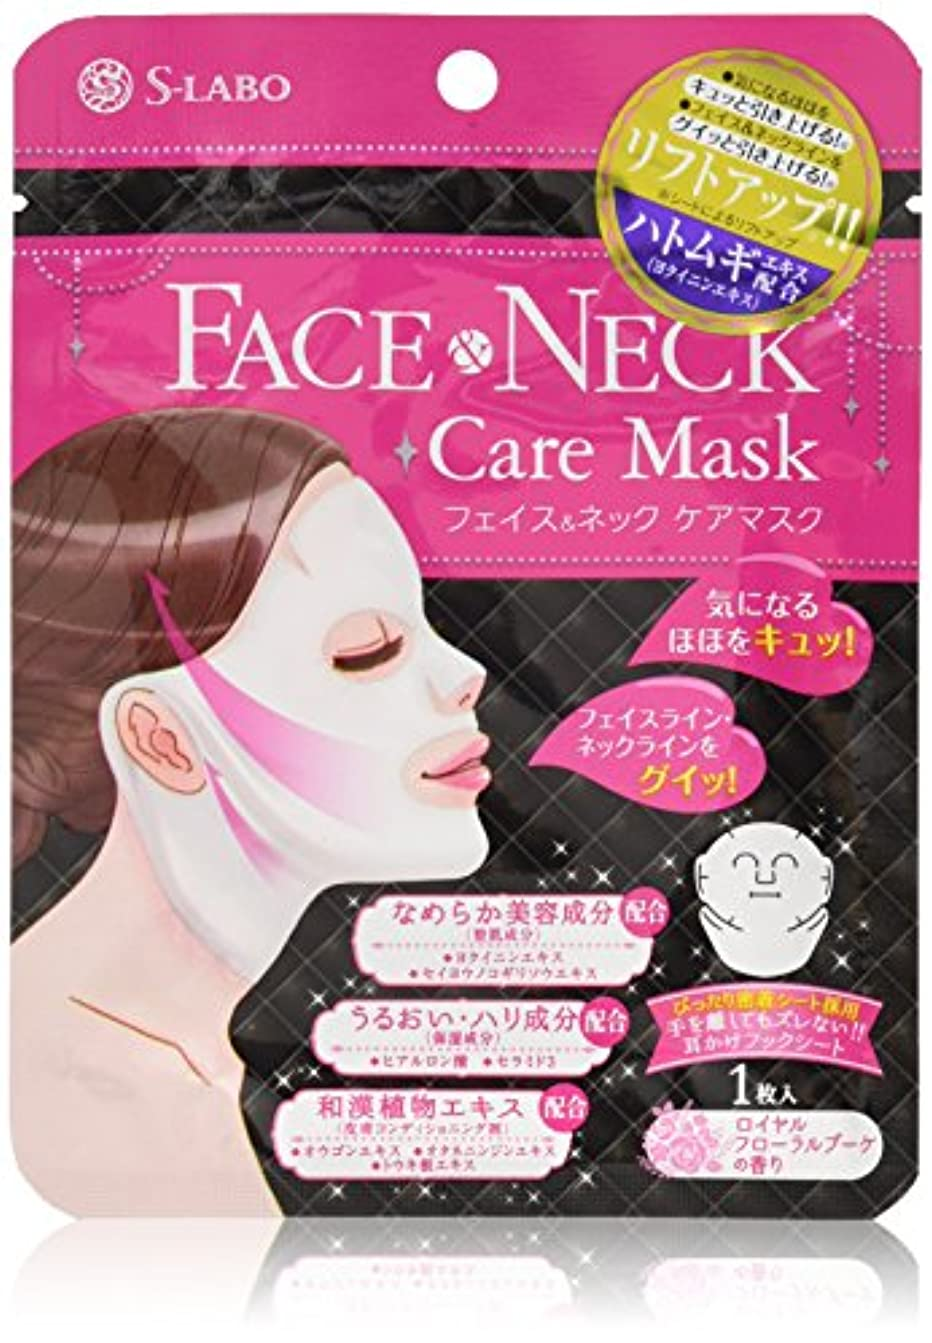 S-LABO フェイス & ネックケアマスク (1枚入)